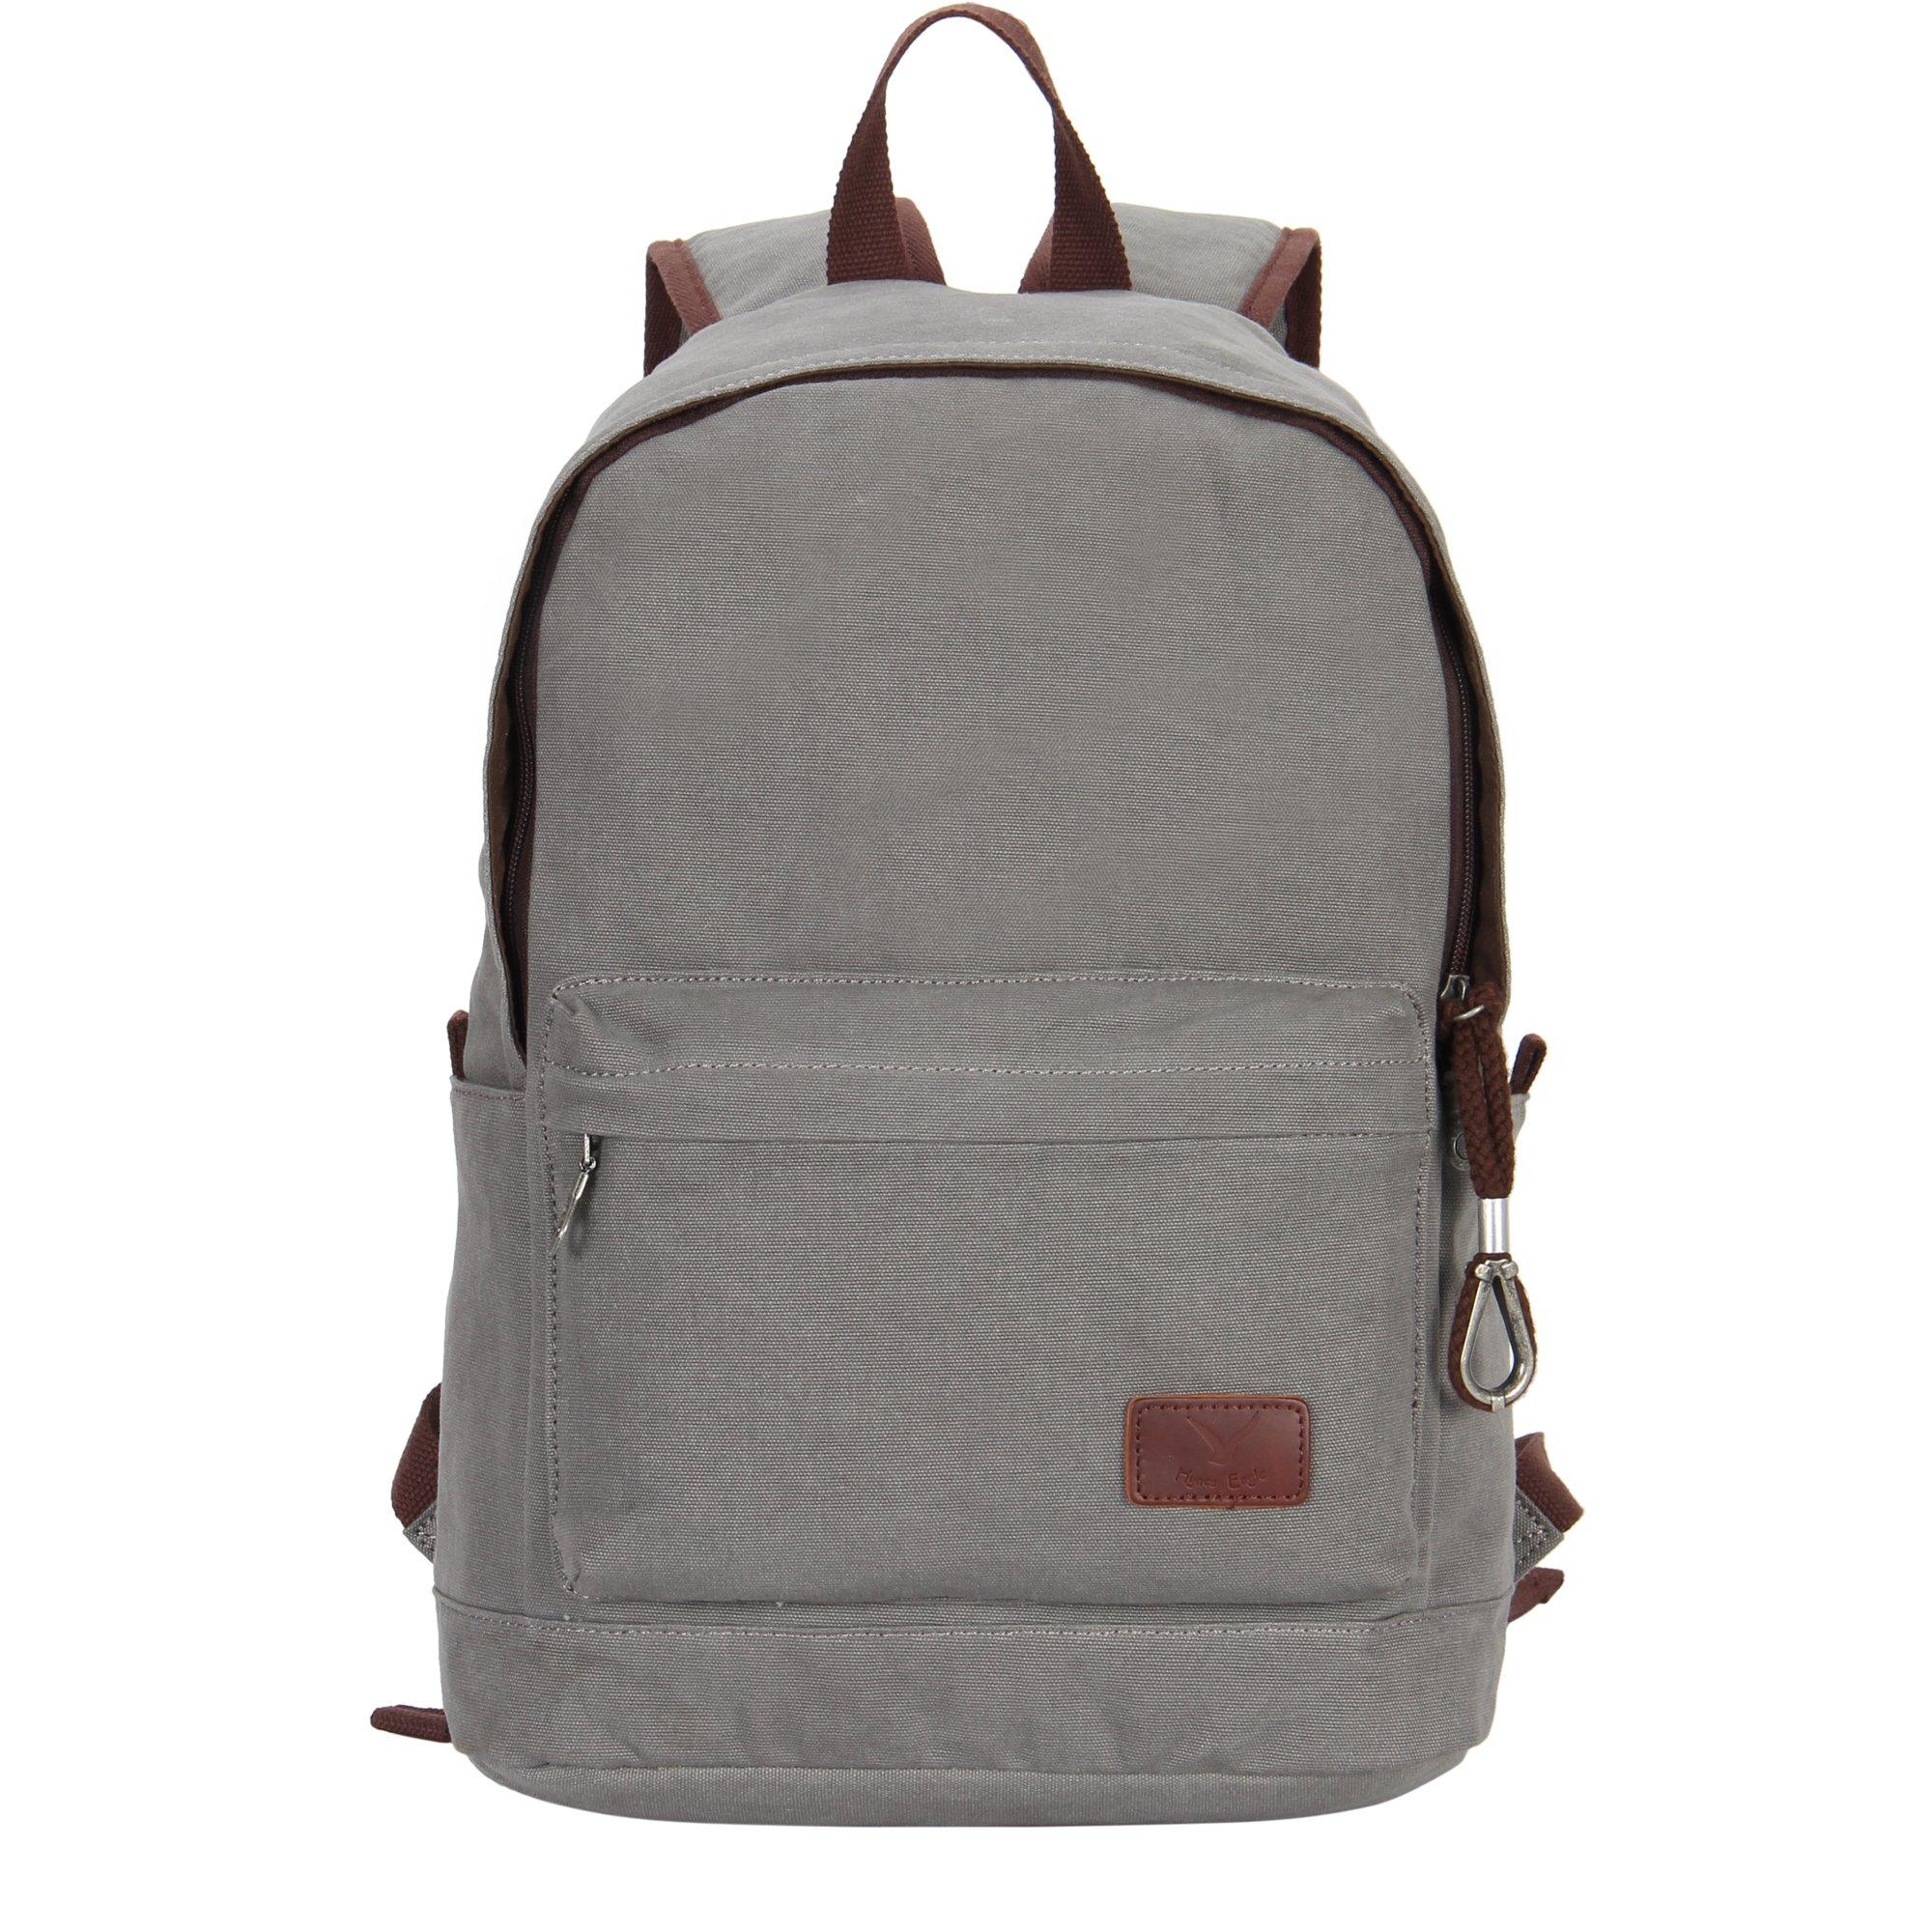 Hynes Eagle Unisex Casual Daypack Canvas School Bag Travel Backpack 23 Liters Black Grey